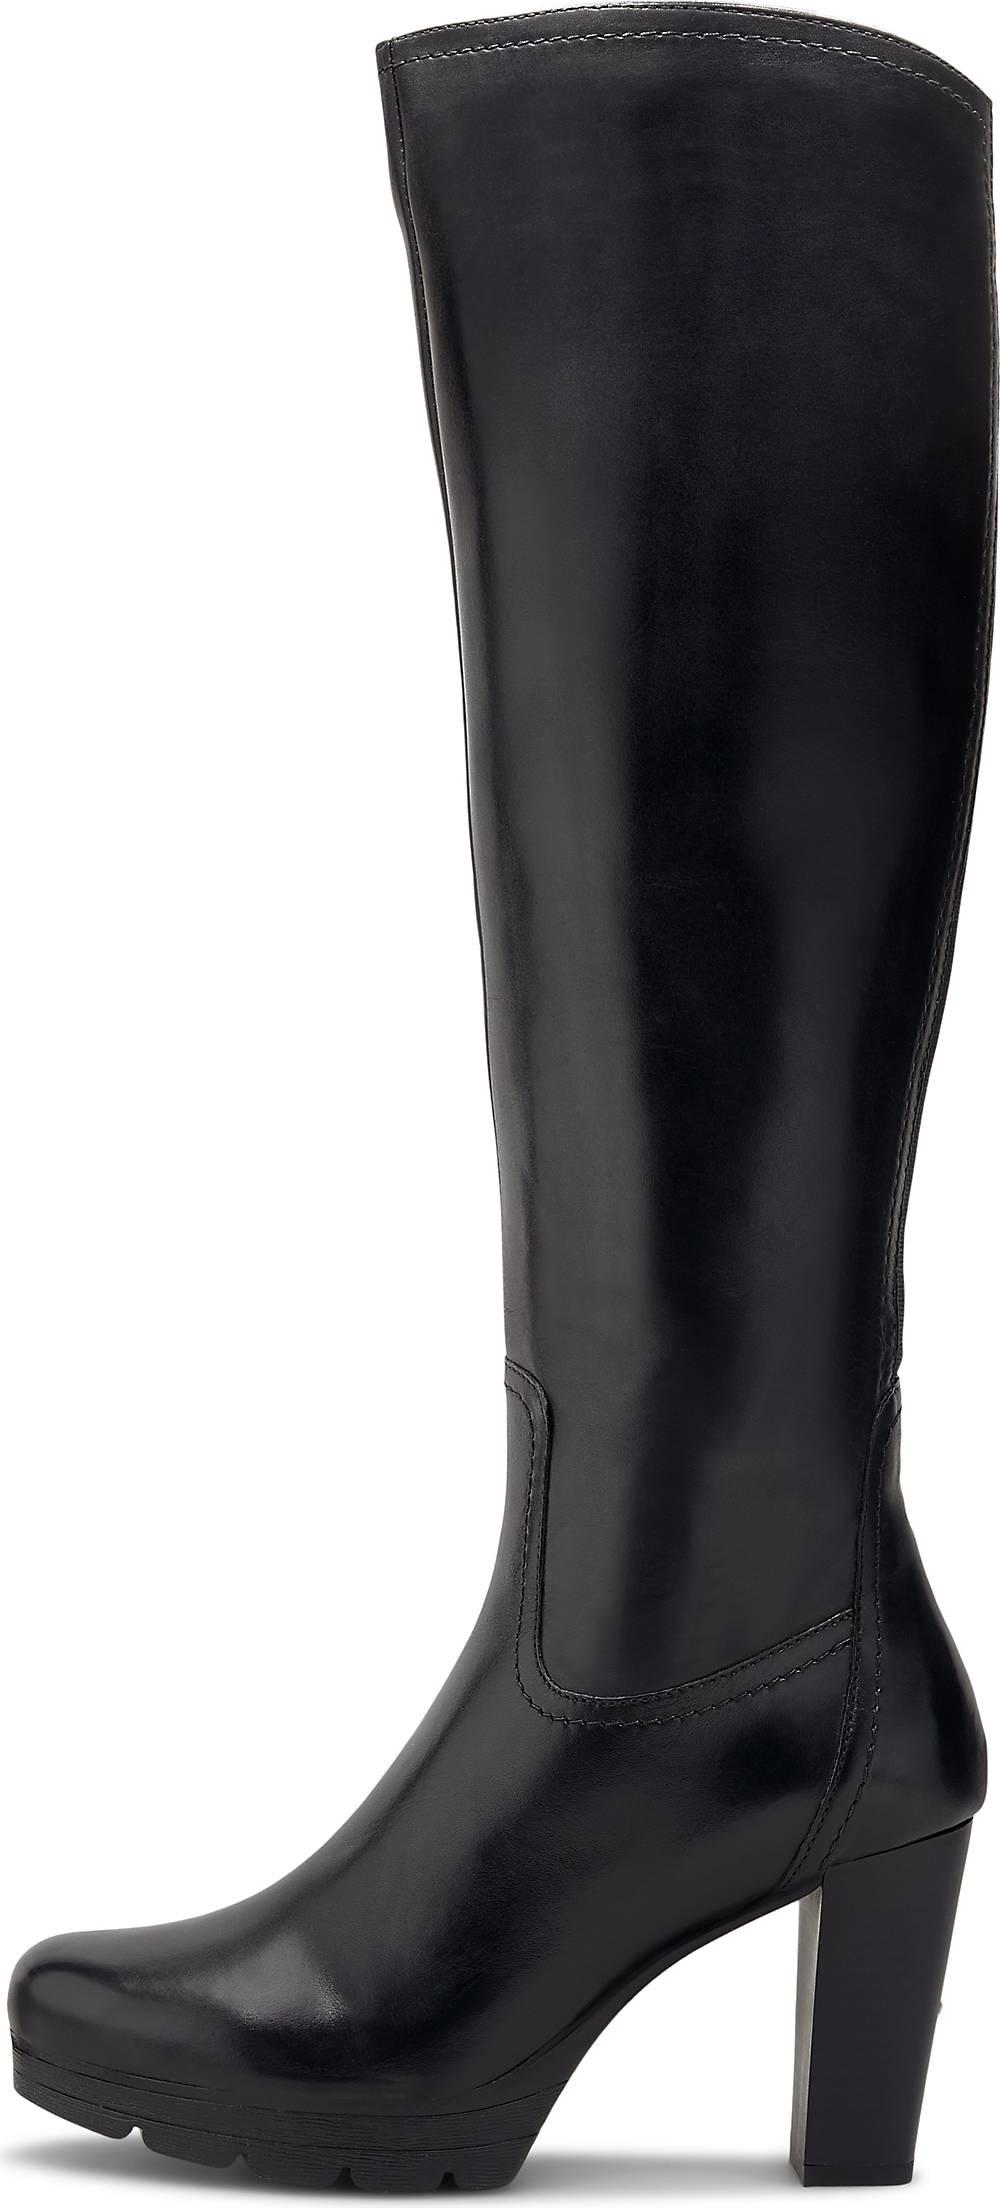 Flare & Brugg| Plateau-Stiefel in schwarz| Stiefel für Damen | Schuhe > Stiefel > Plateaustiefel | Flare & Brugg